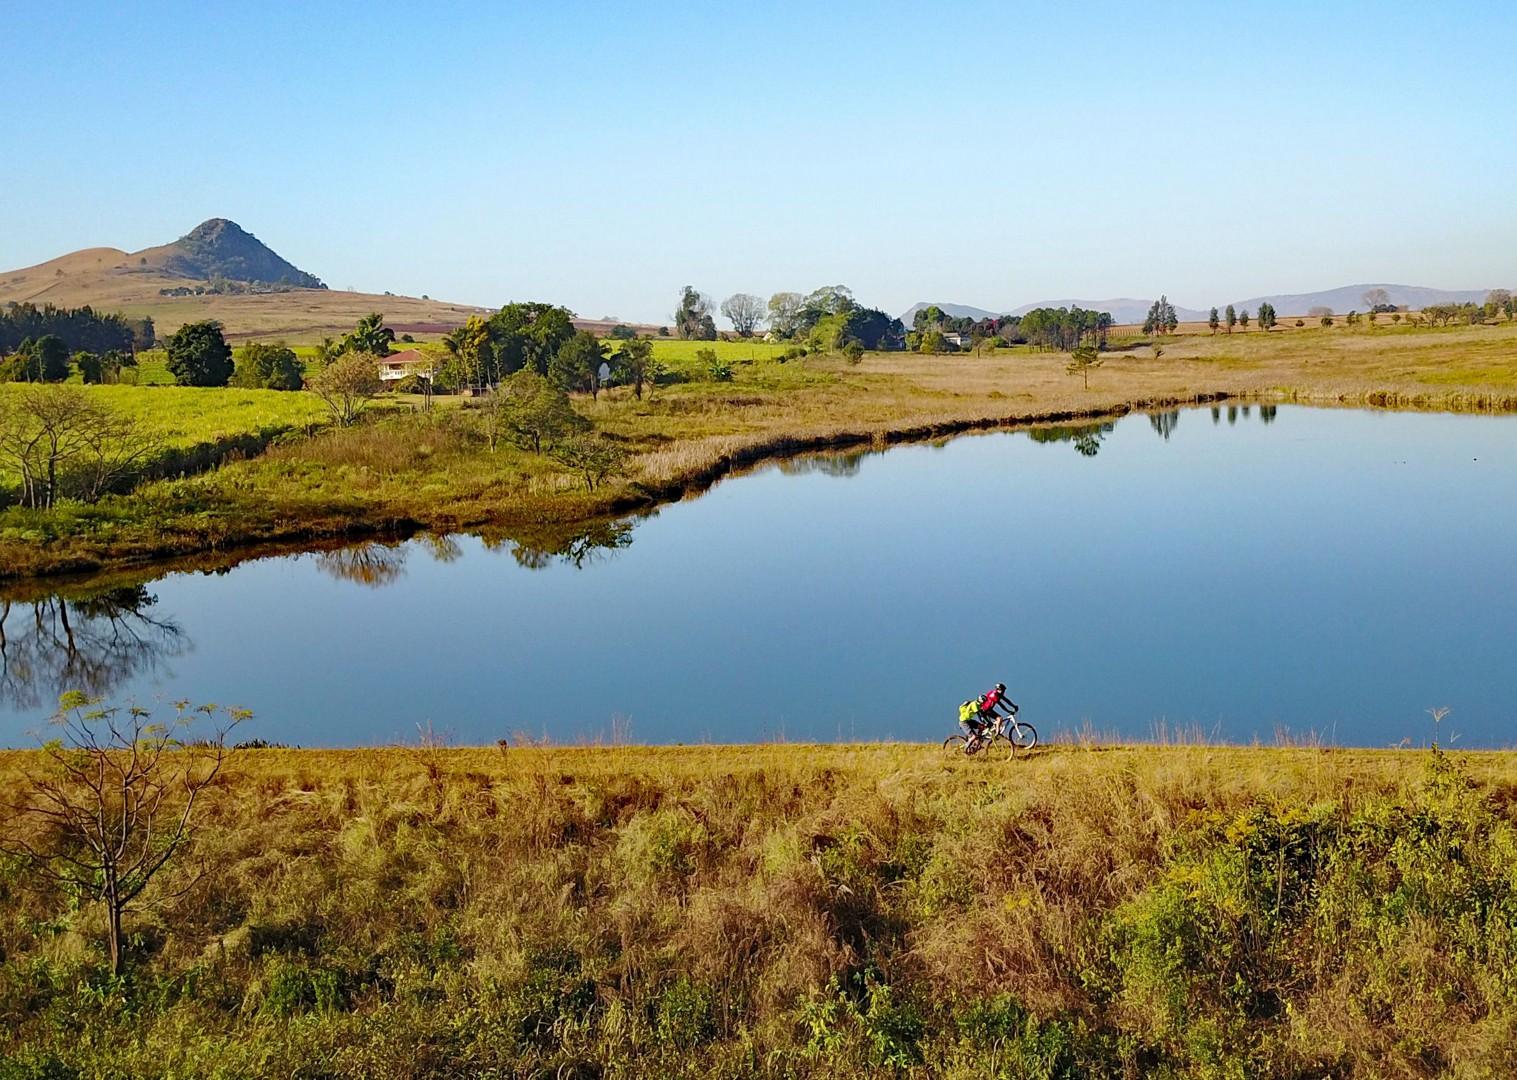 africa-swaziland-singletrack-and-sundowners-guided-mountain-bike-holiday.jpg - Swaziland - Singletrack and Sundowners - Guided Mountain Bike Holiday - Mountain Biking